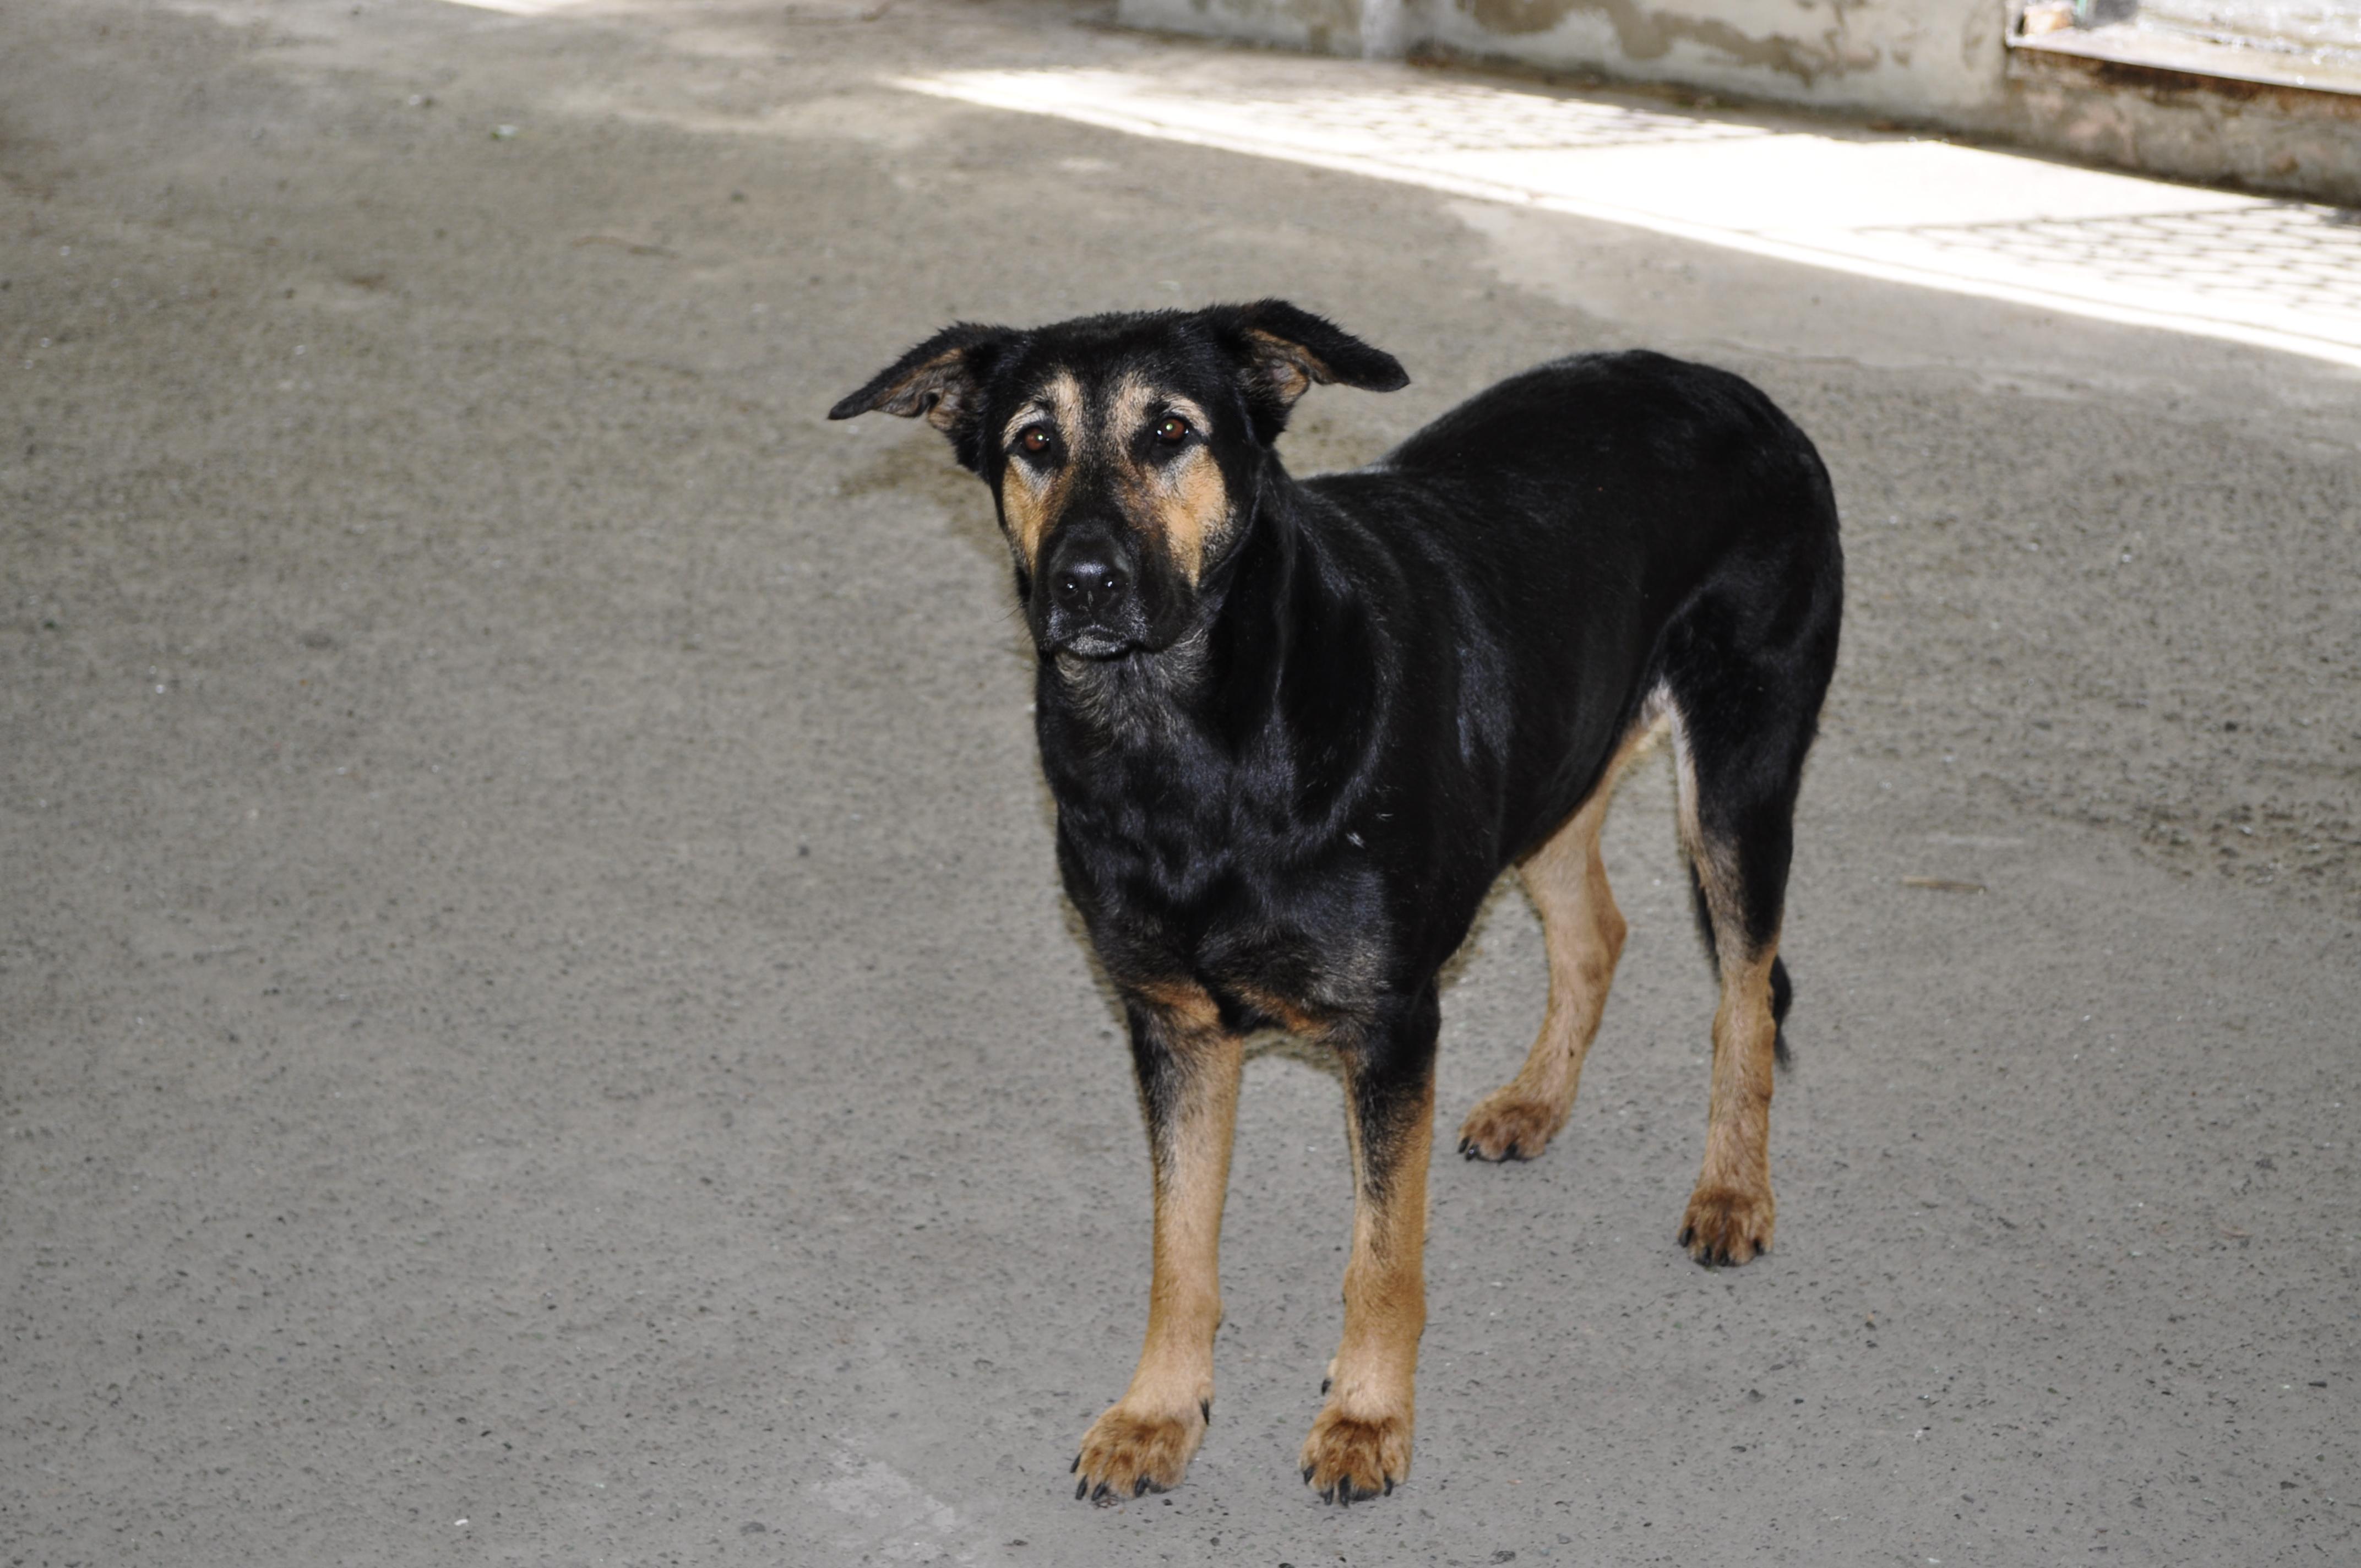 Dog, Animal, Black, K9, Pet, HQ Photo